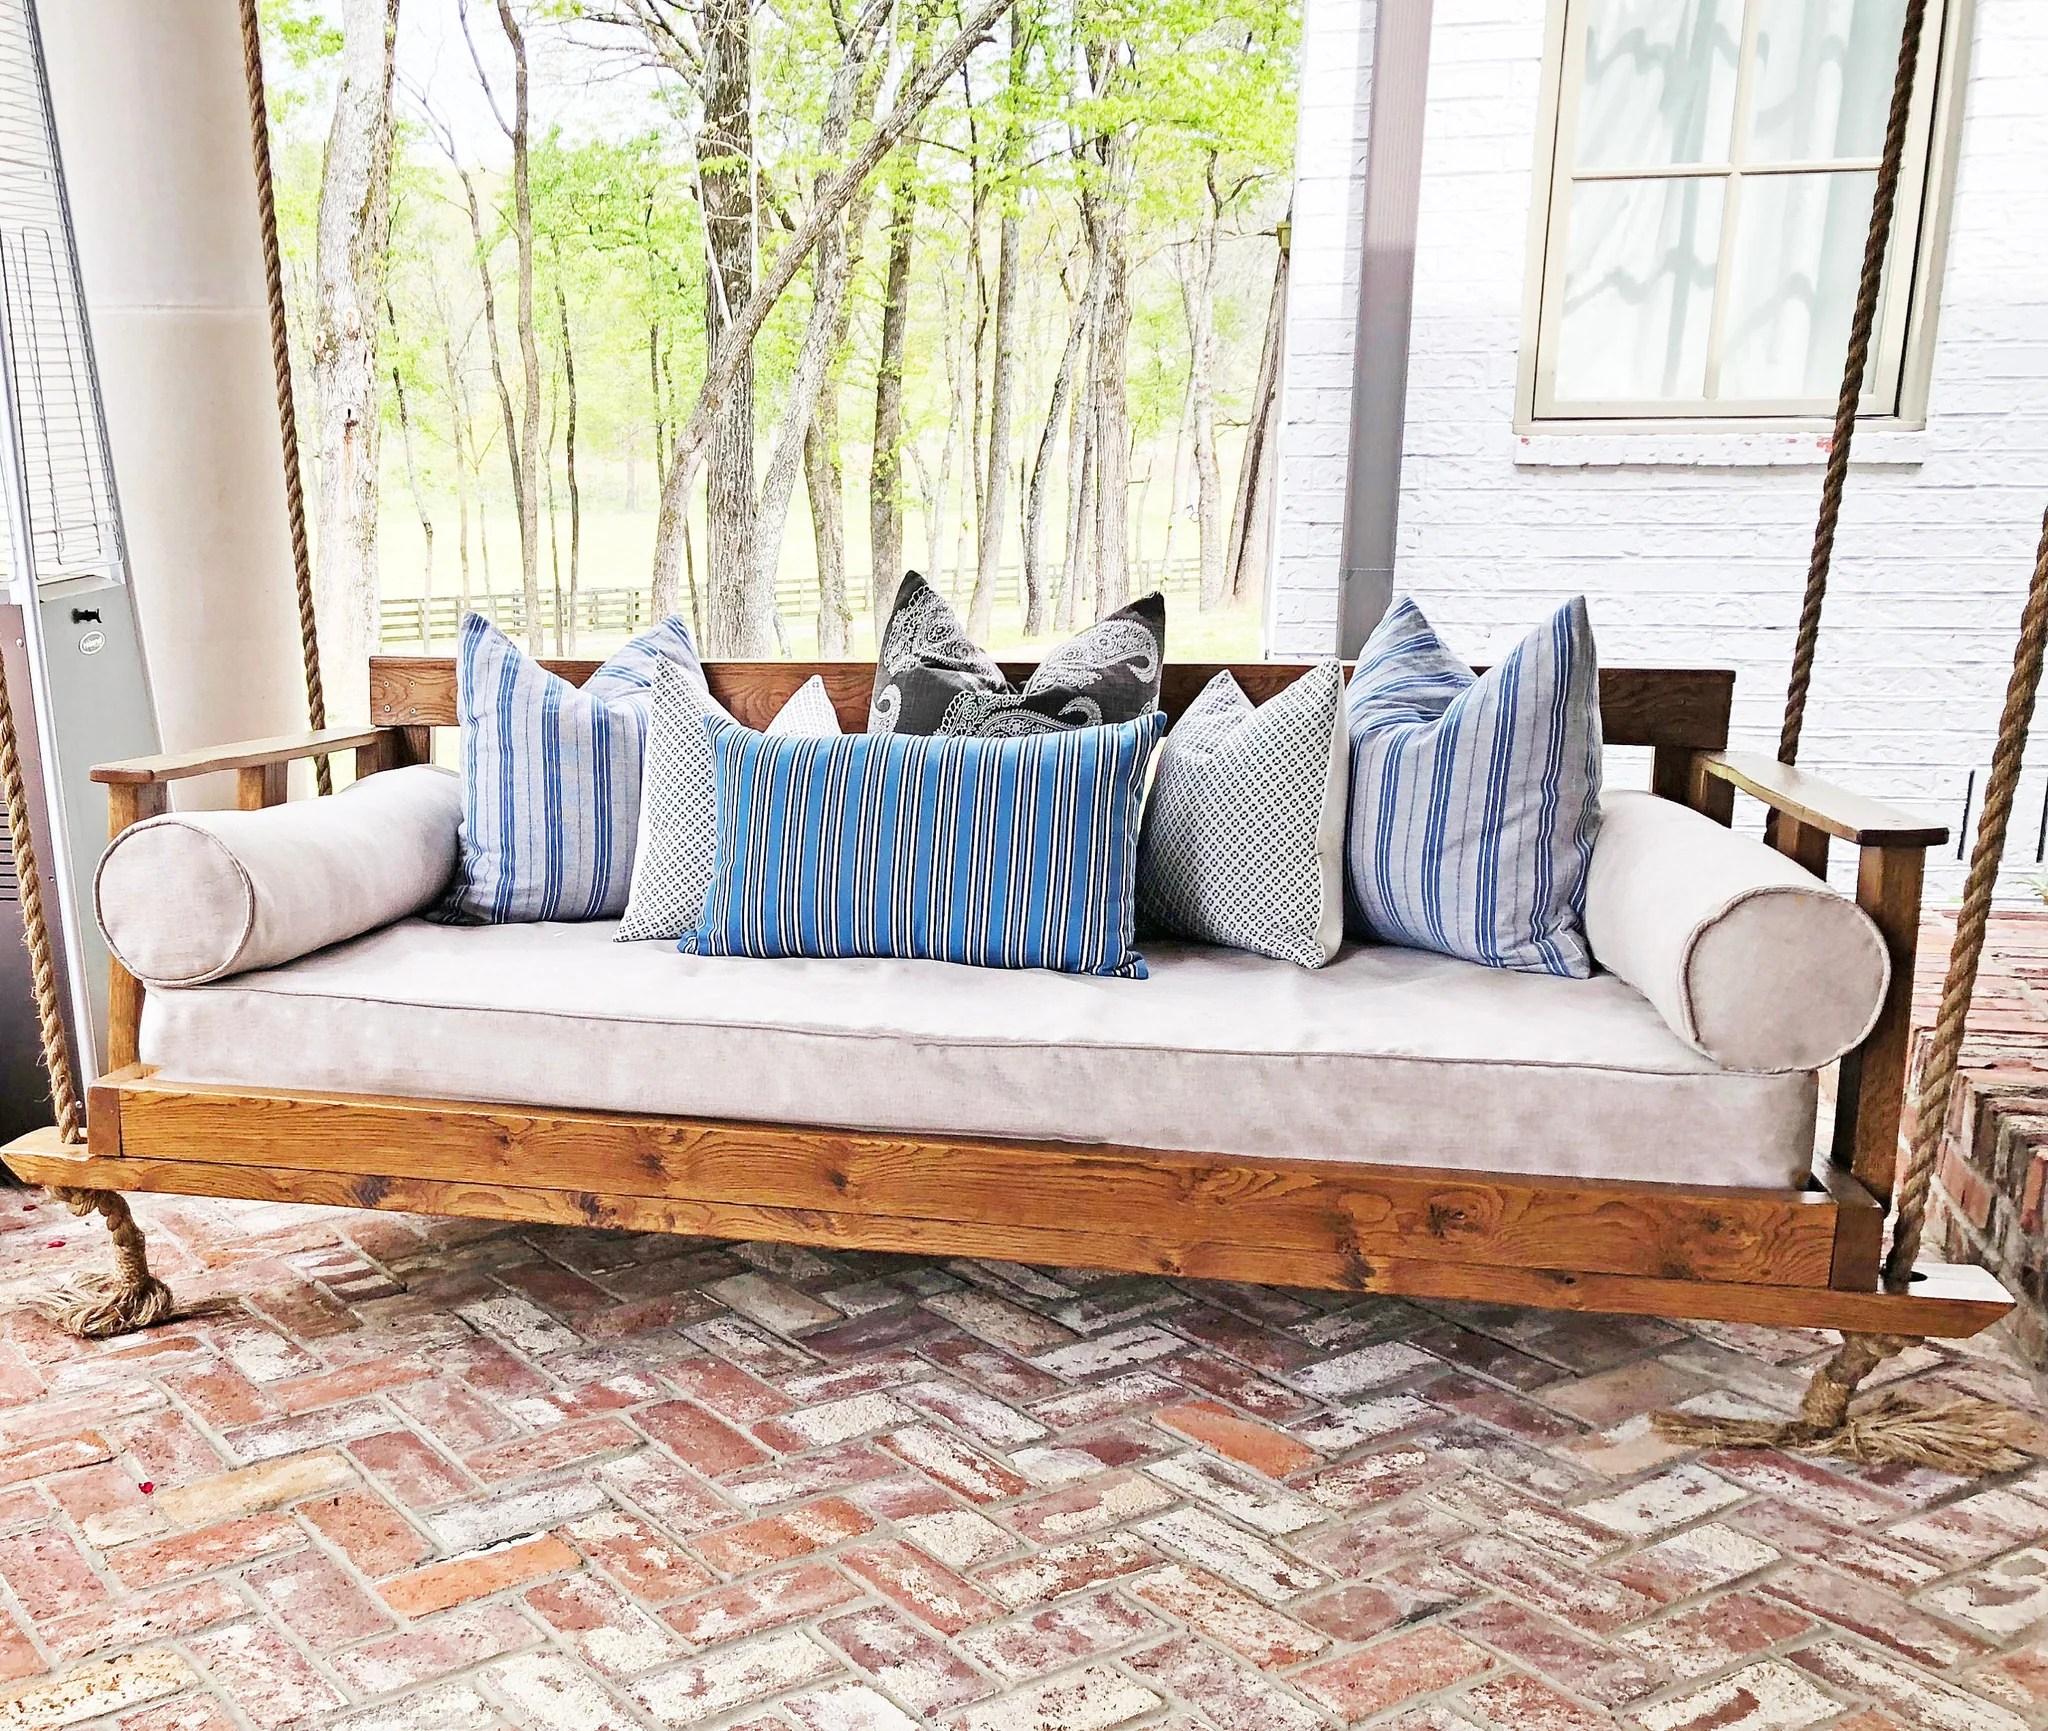 outdoor porch swing mattress cover twin mattress cover indoor outdoor tan porch daybed mattress cover day bed sheet linen crib size mattress